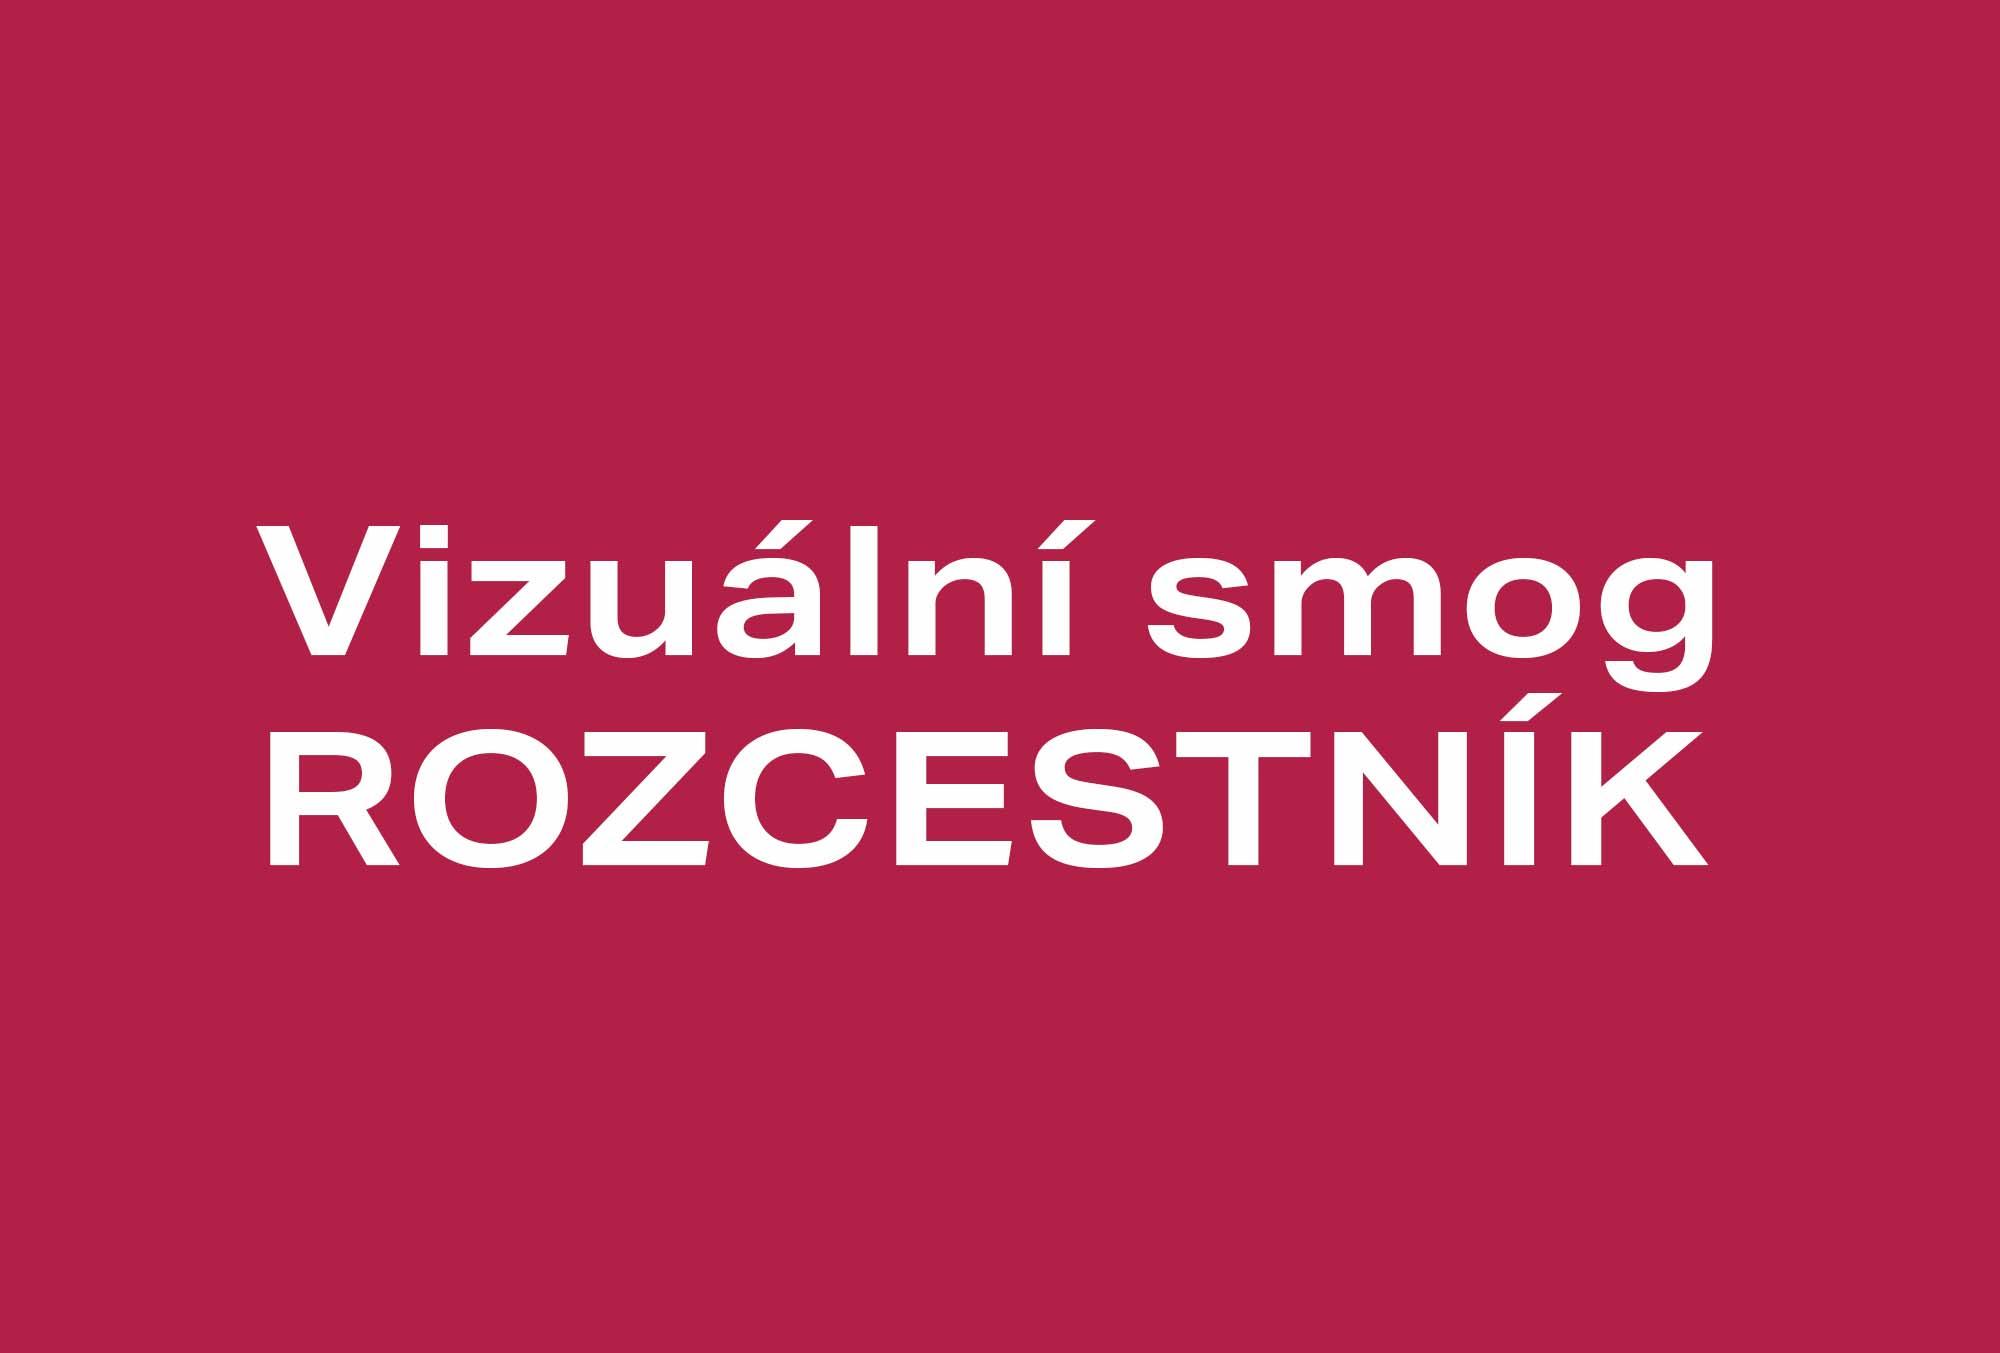 TH_vizualni_smog_rozcestnik